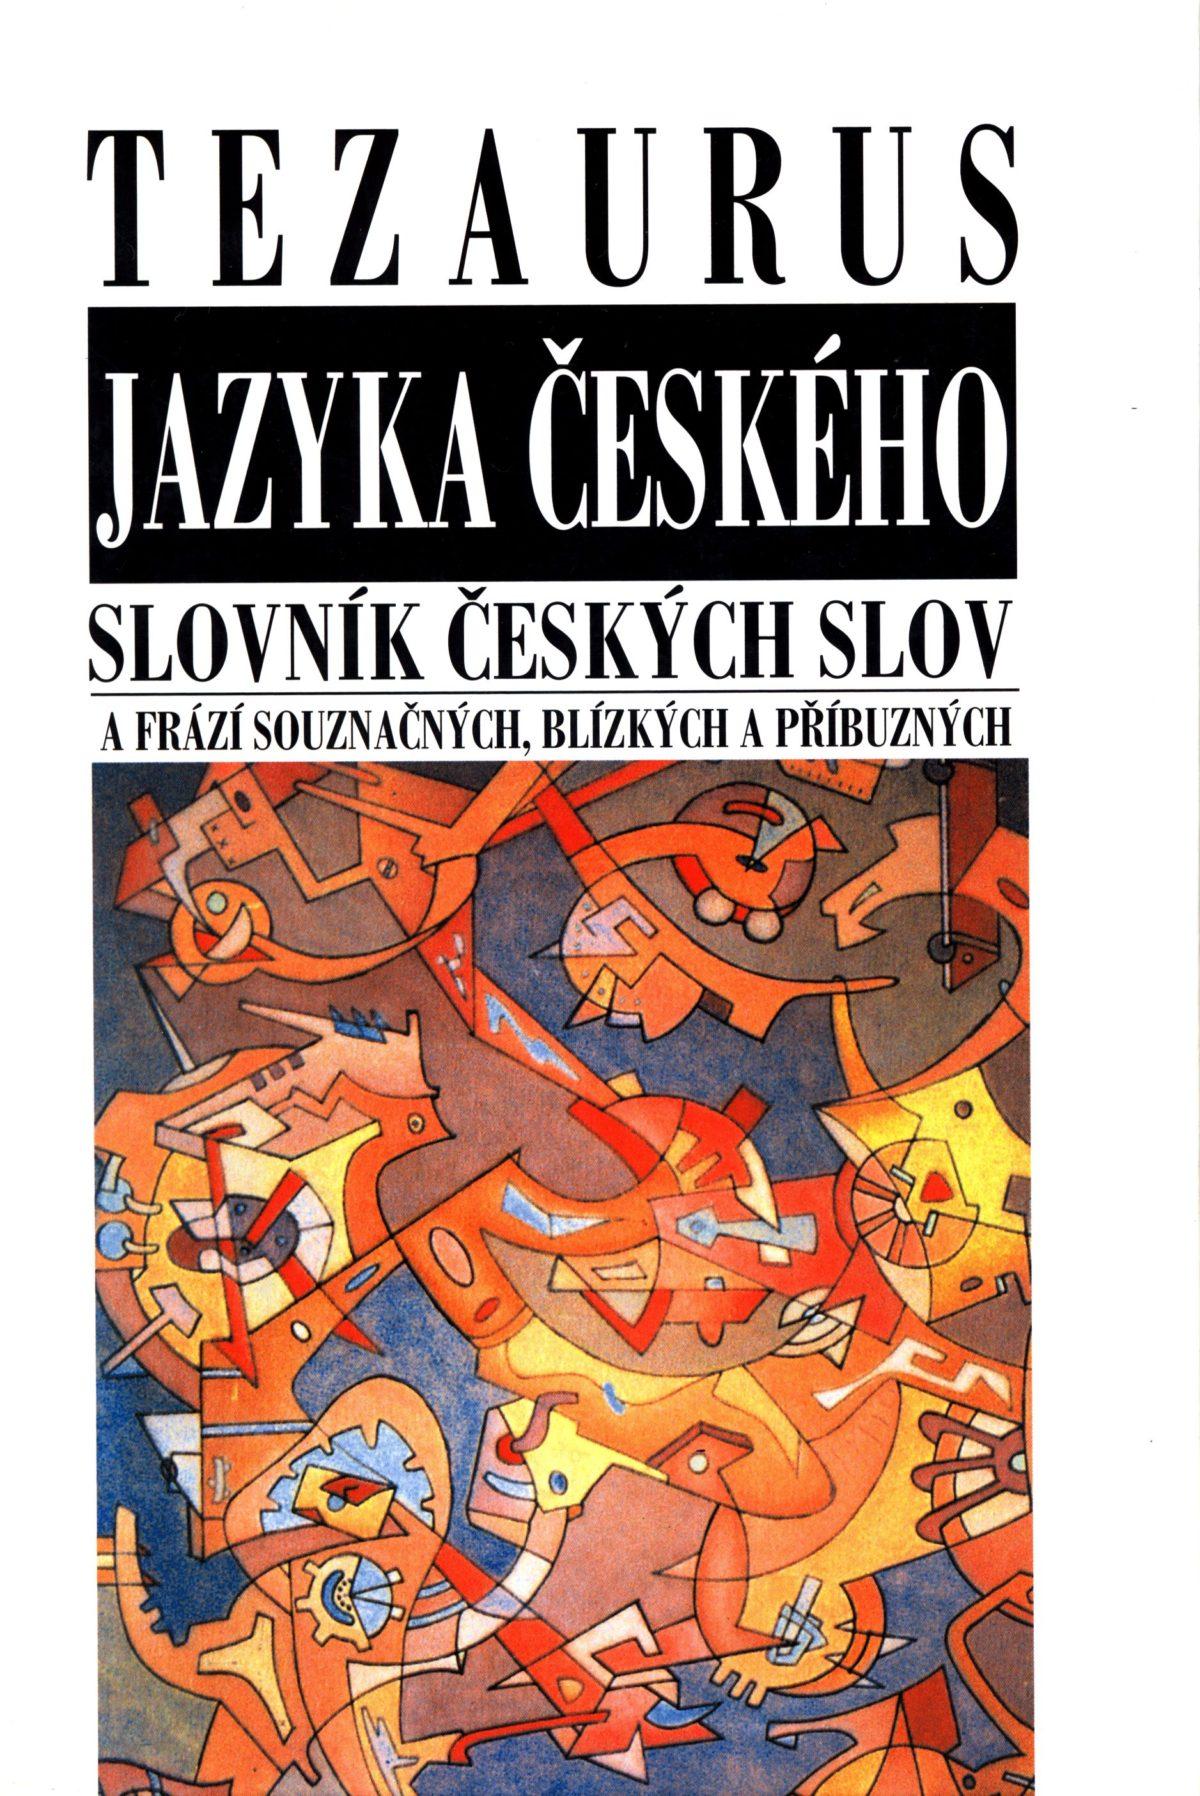 Tezaurus jazyka českého